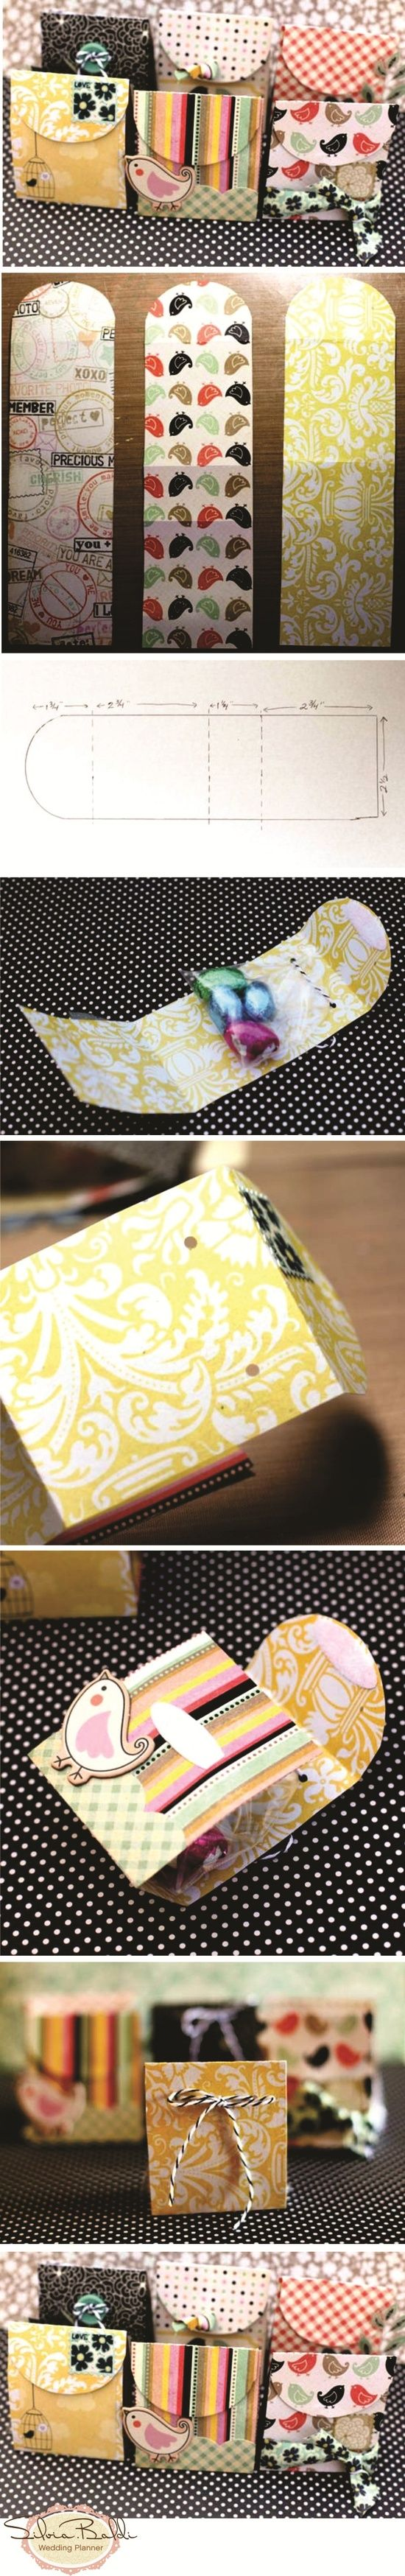 fun gift box template & ideas Ideas de envoltorios para regalos! http://www.regalosfabulosos.com/ Más